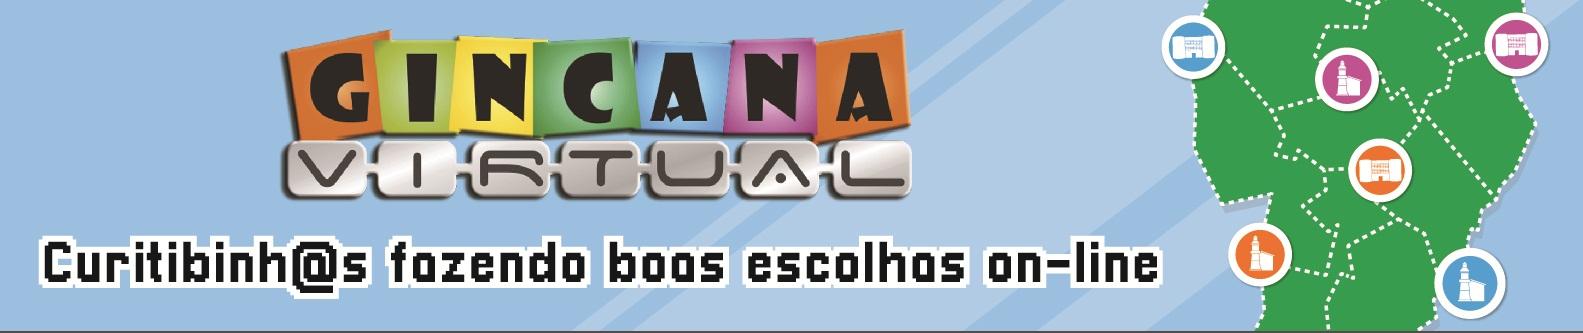 Banner Gincana Virtual 2018